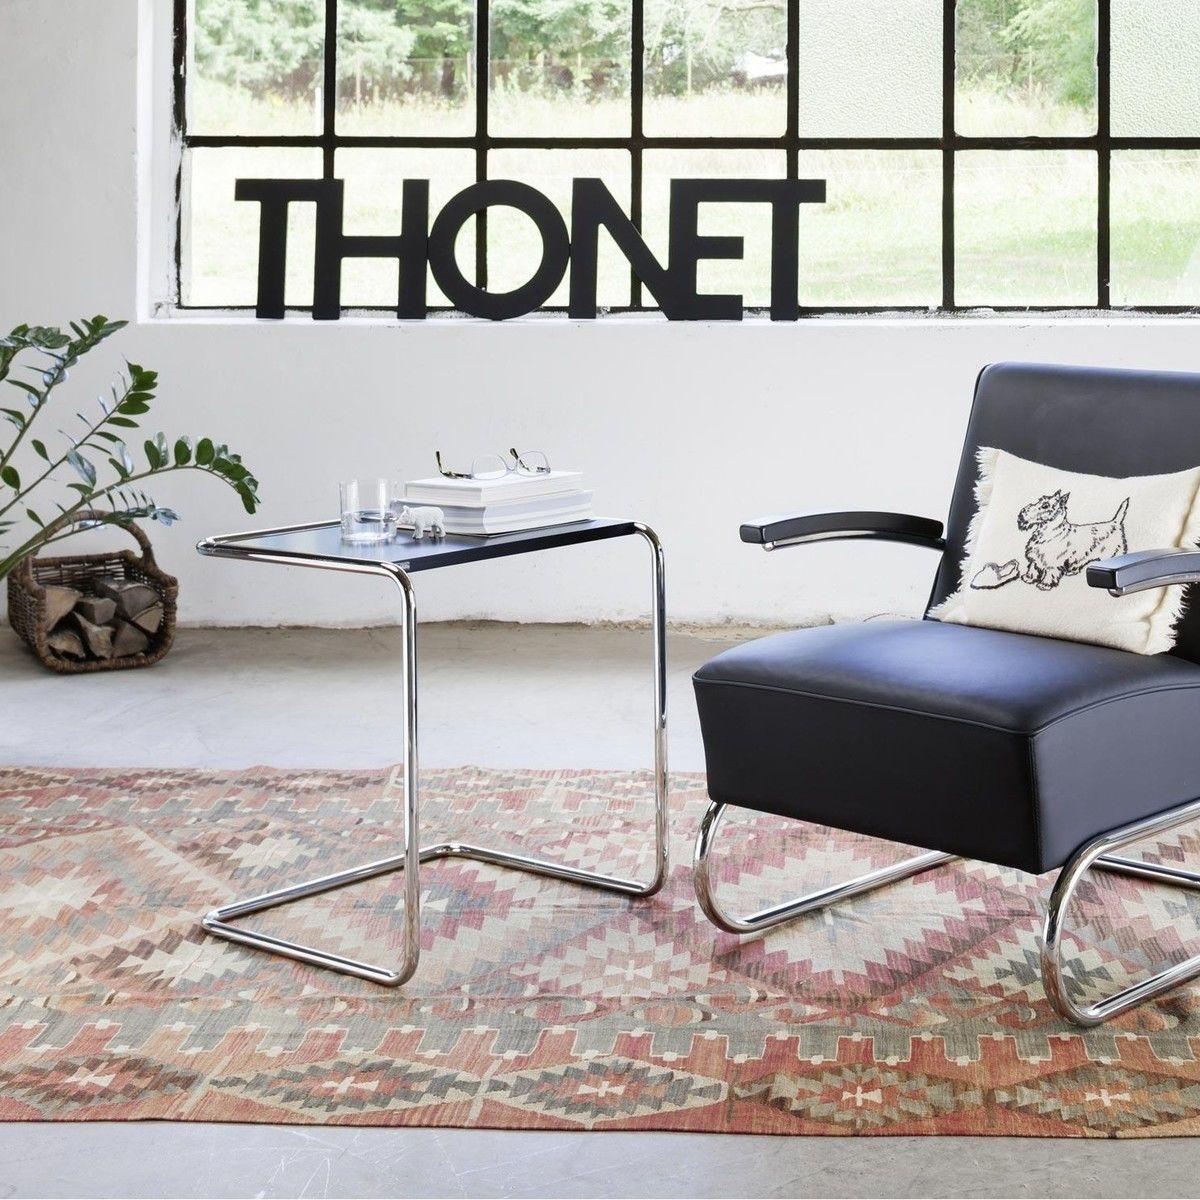 thonet b 97 beistelltisch thonet. Black Bedroom Furniture Sets. Home Design Ideas